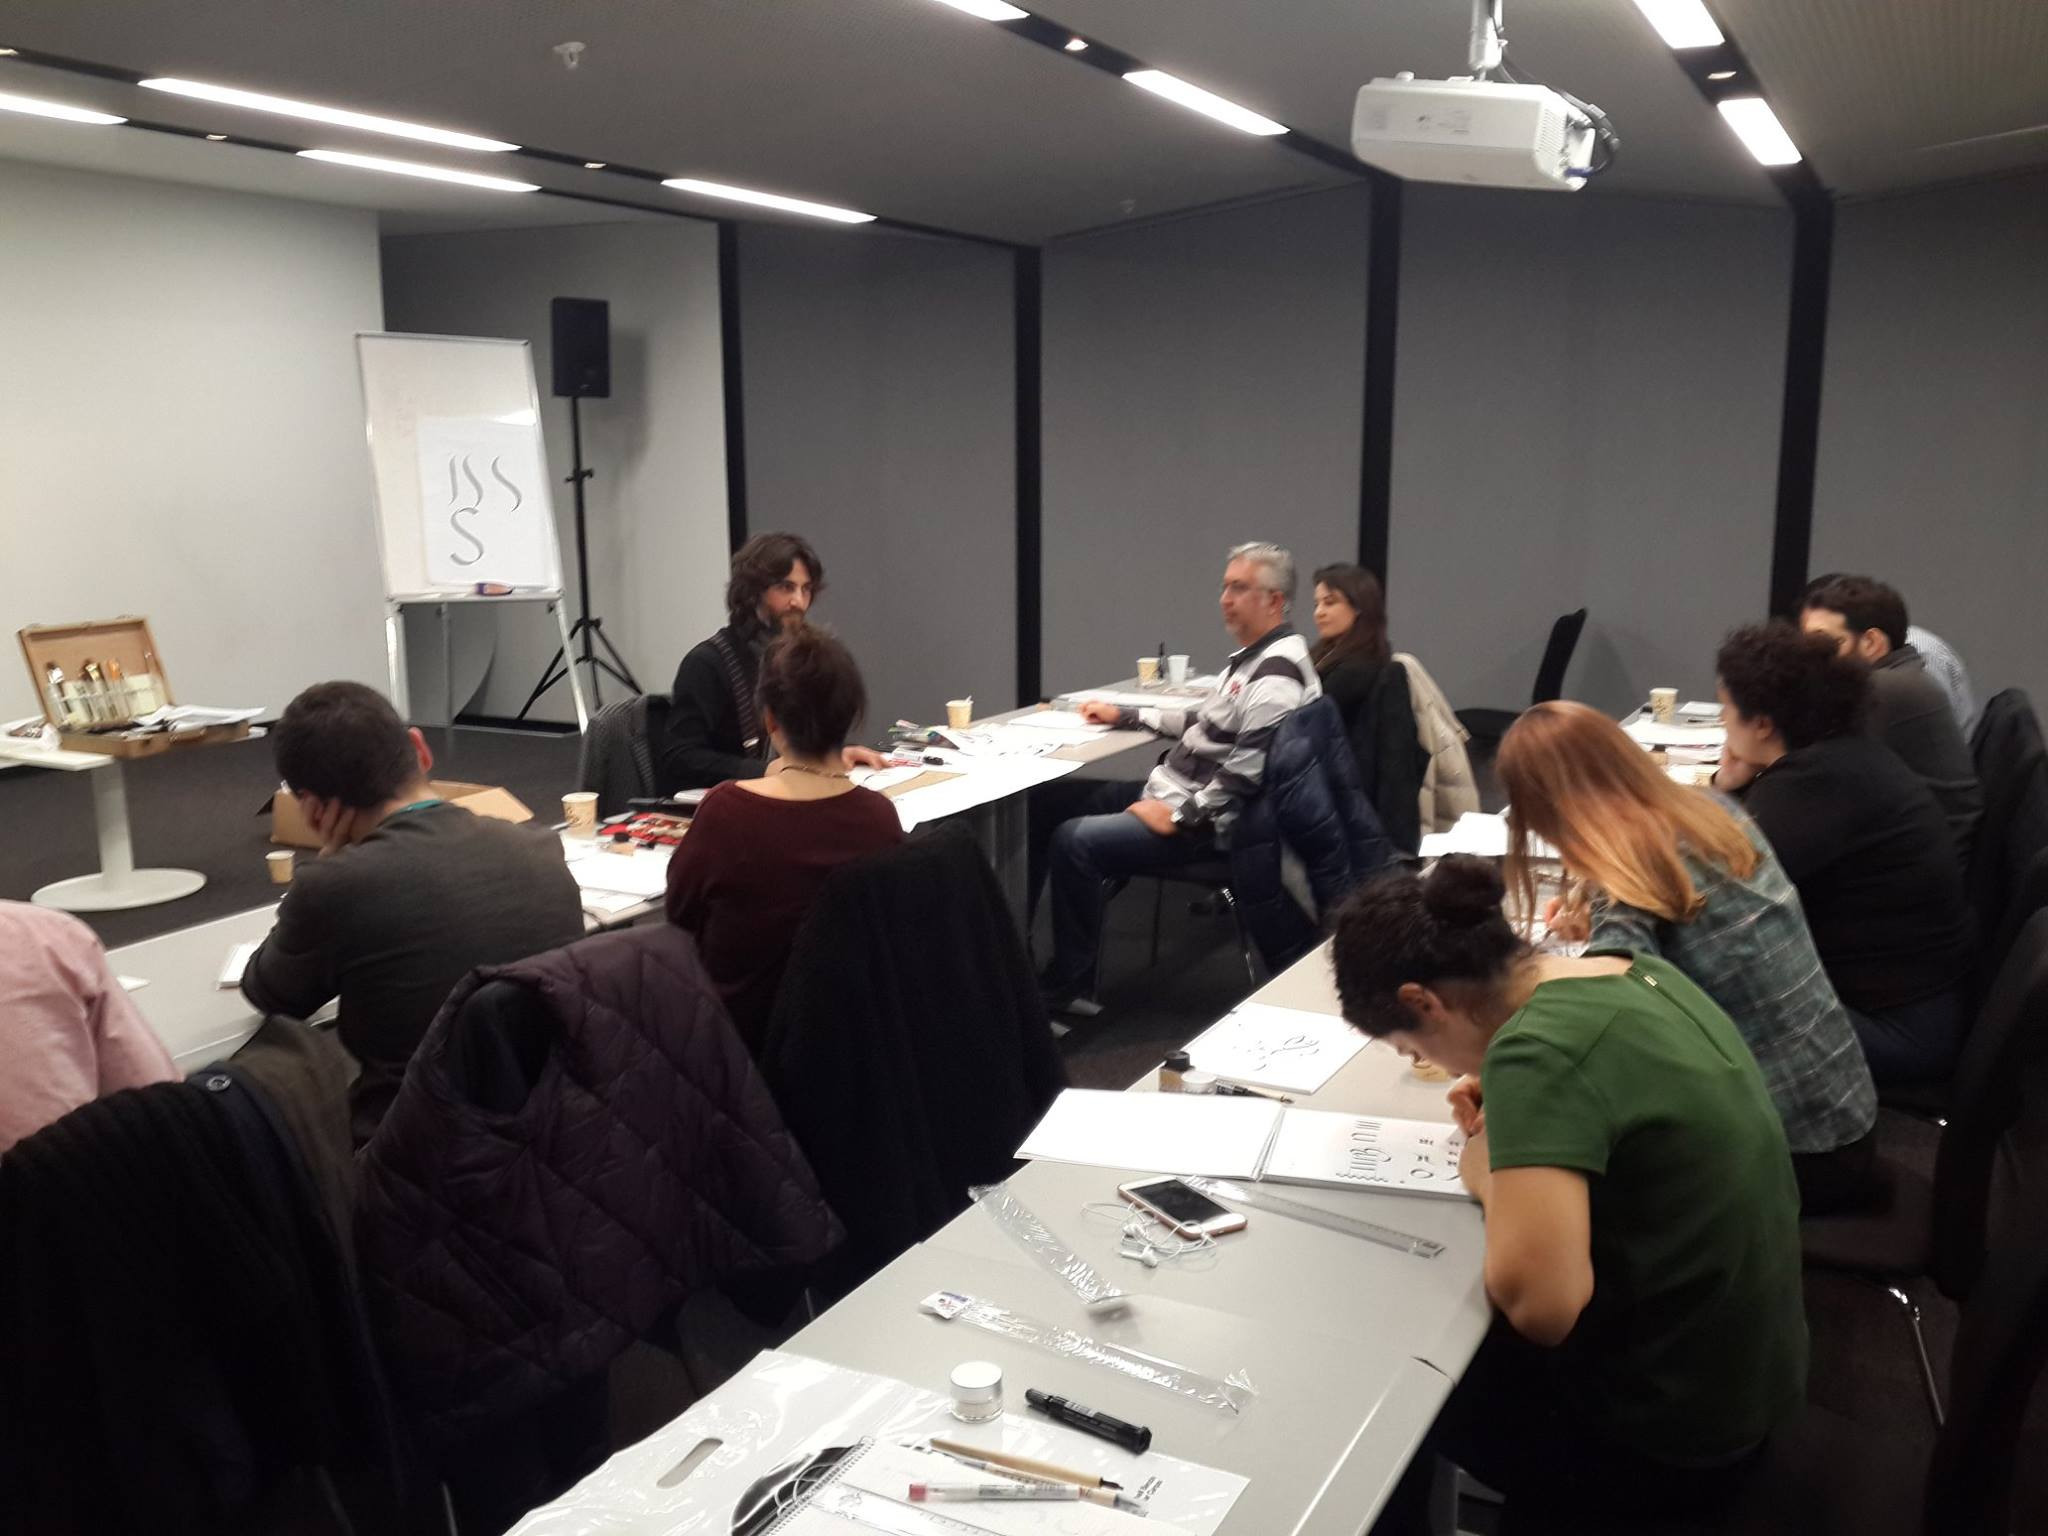 kurumsal-kaligrafi-kursu